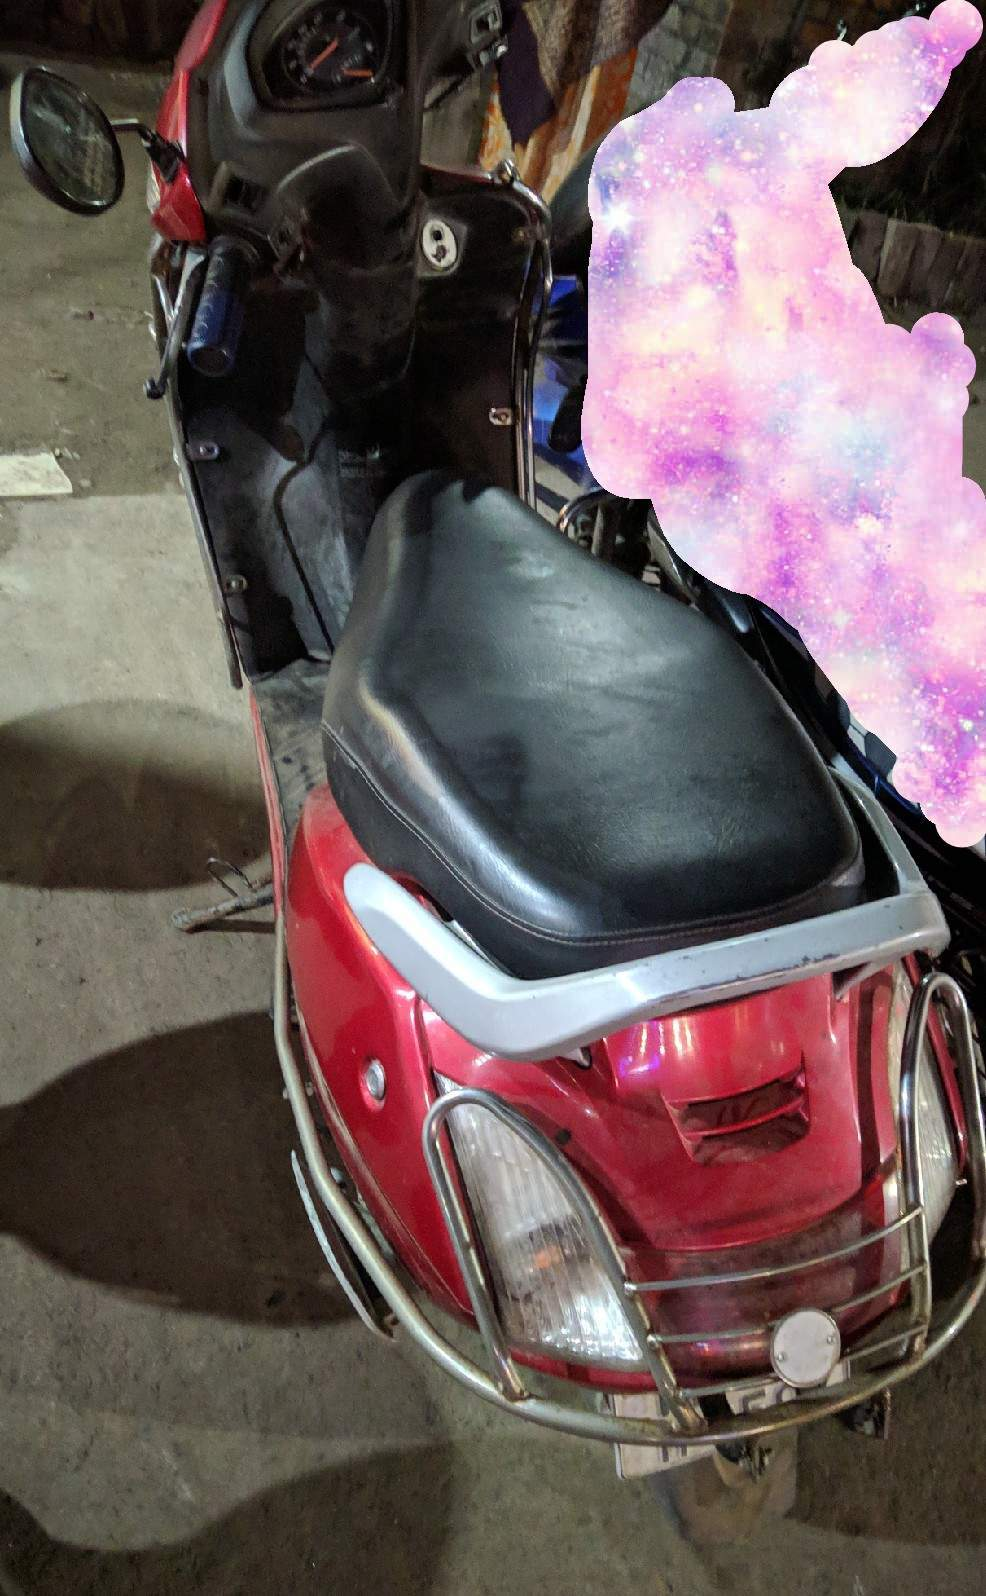 Honda Activa Rear View